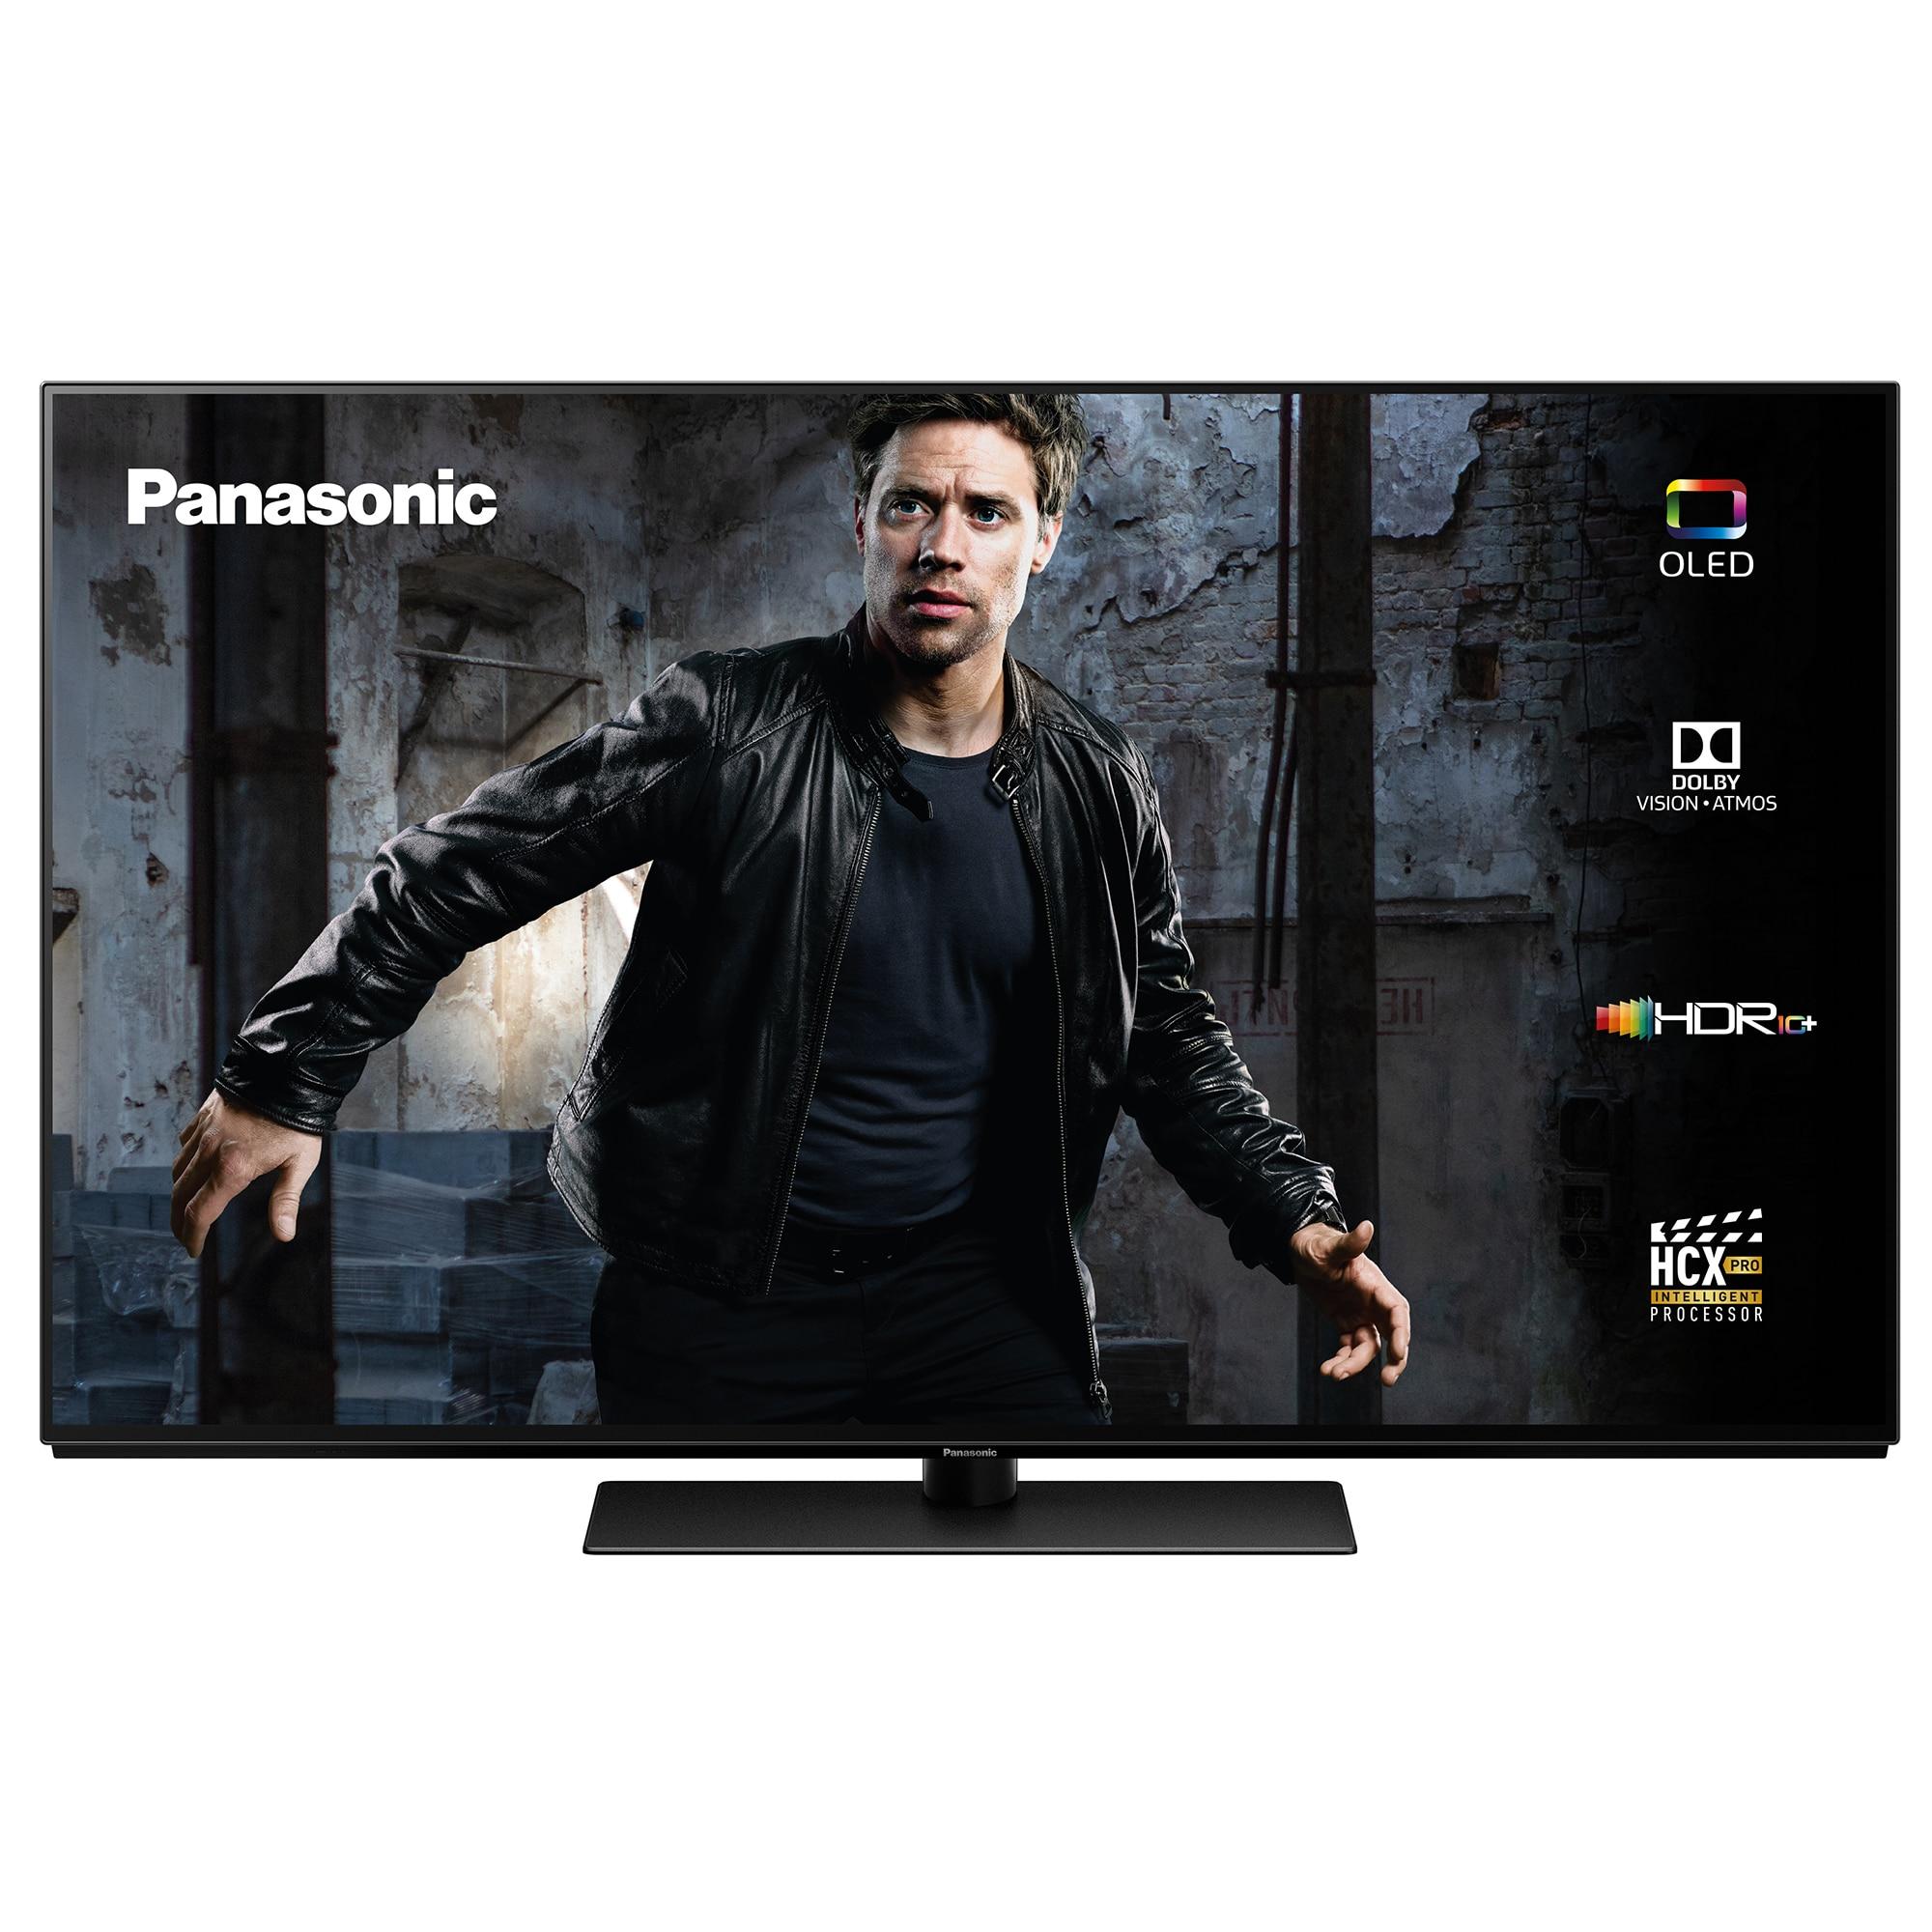 Fotografie Televizor OLED Smart Panasonic, 164 cm, TX-65GZ950E, 4K Ultra HD, Clasa A